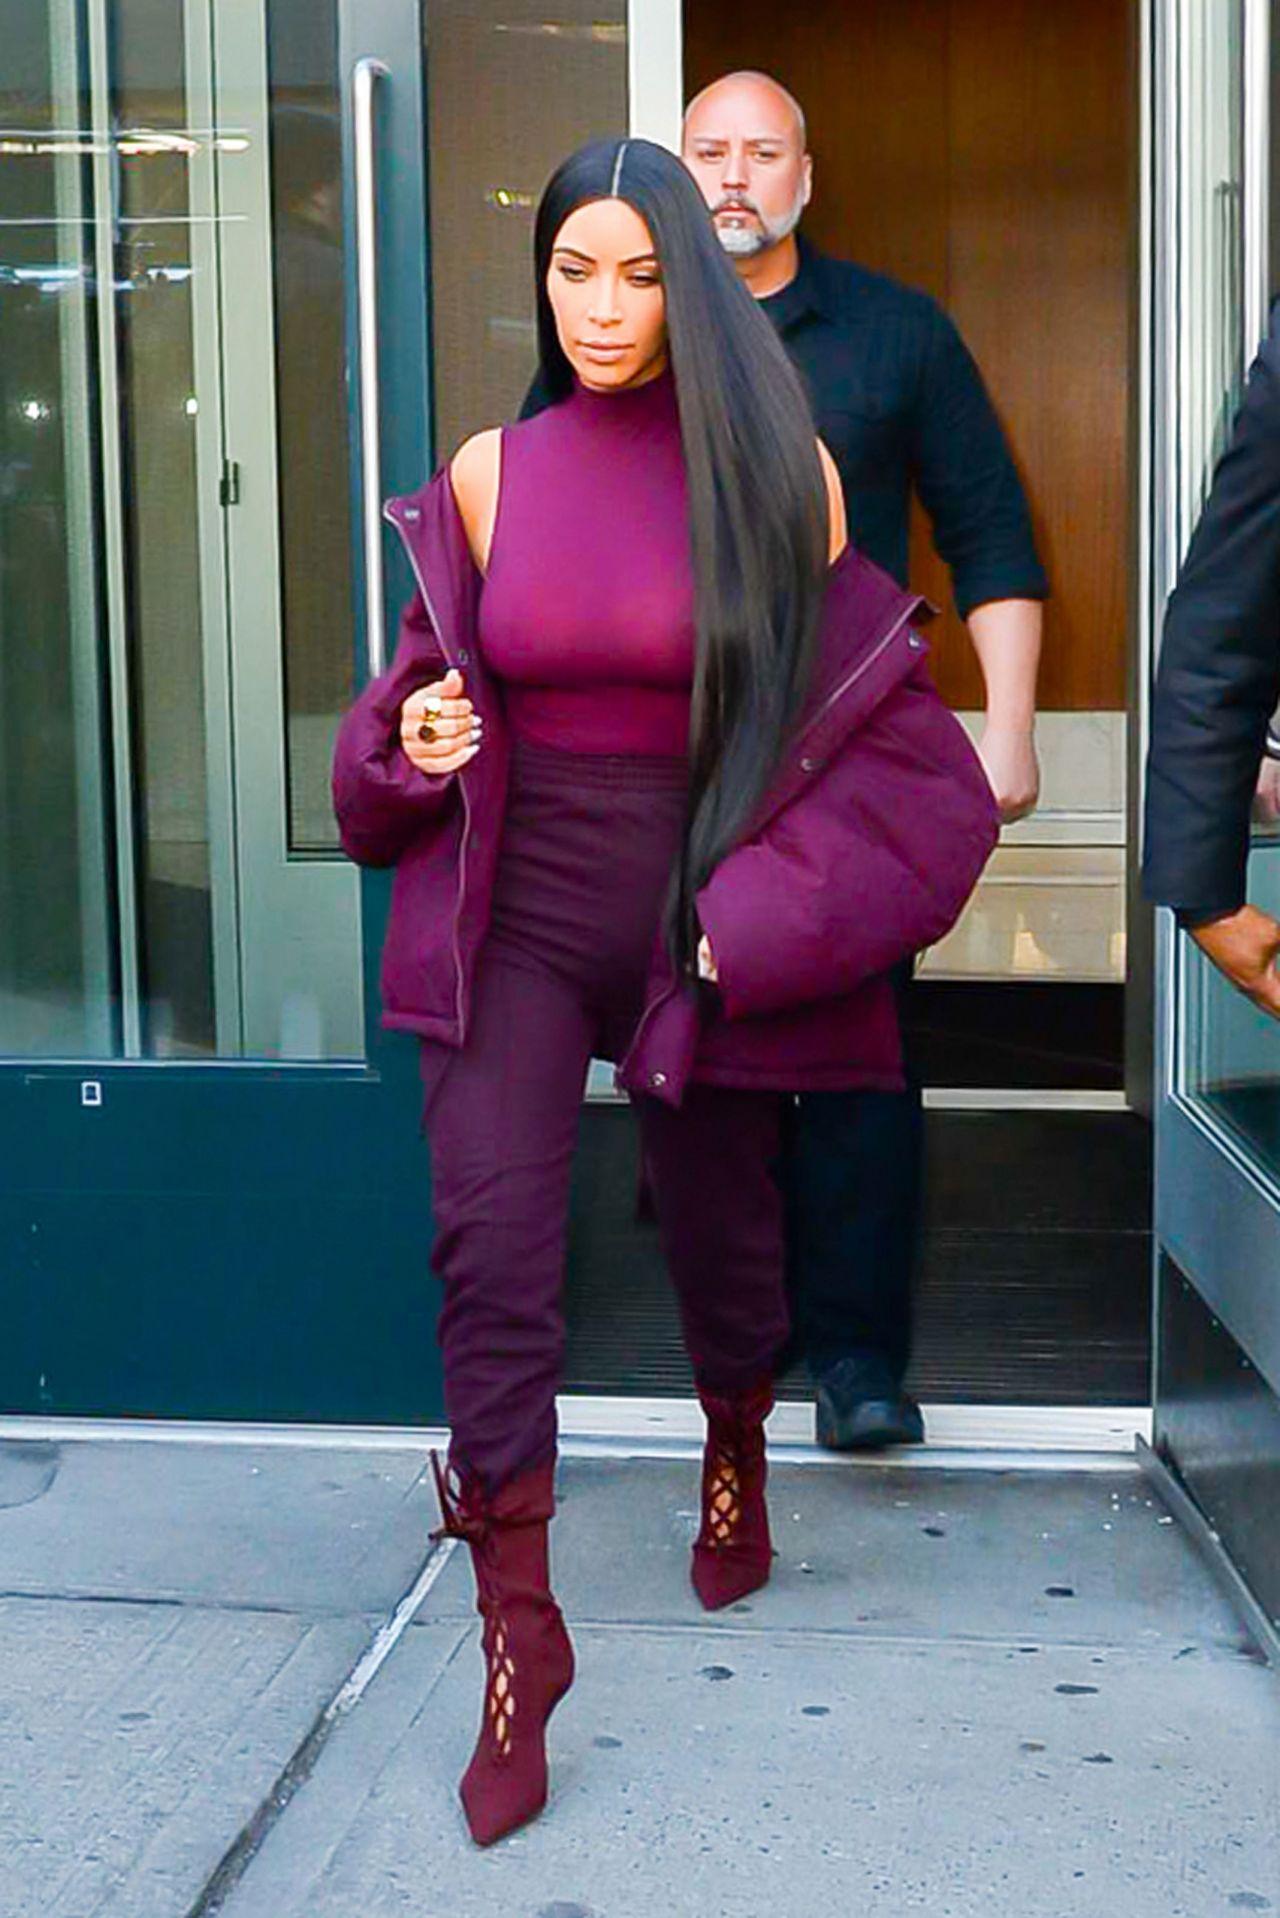 Kim Kardashian Style And Fashion Inspirations New York City 2 15 2017